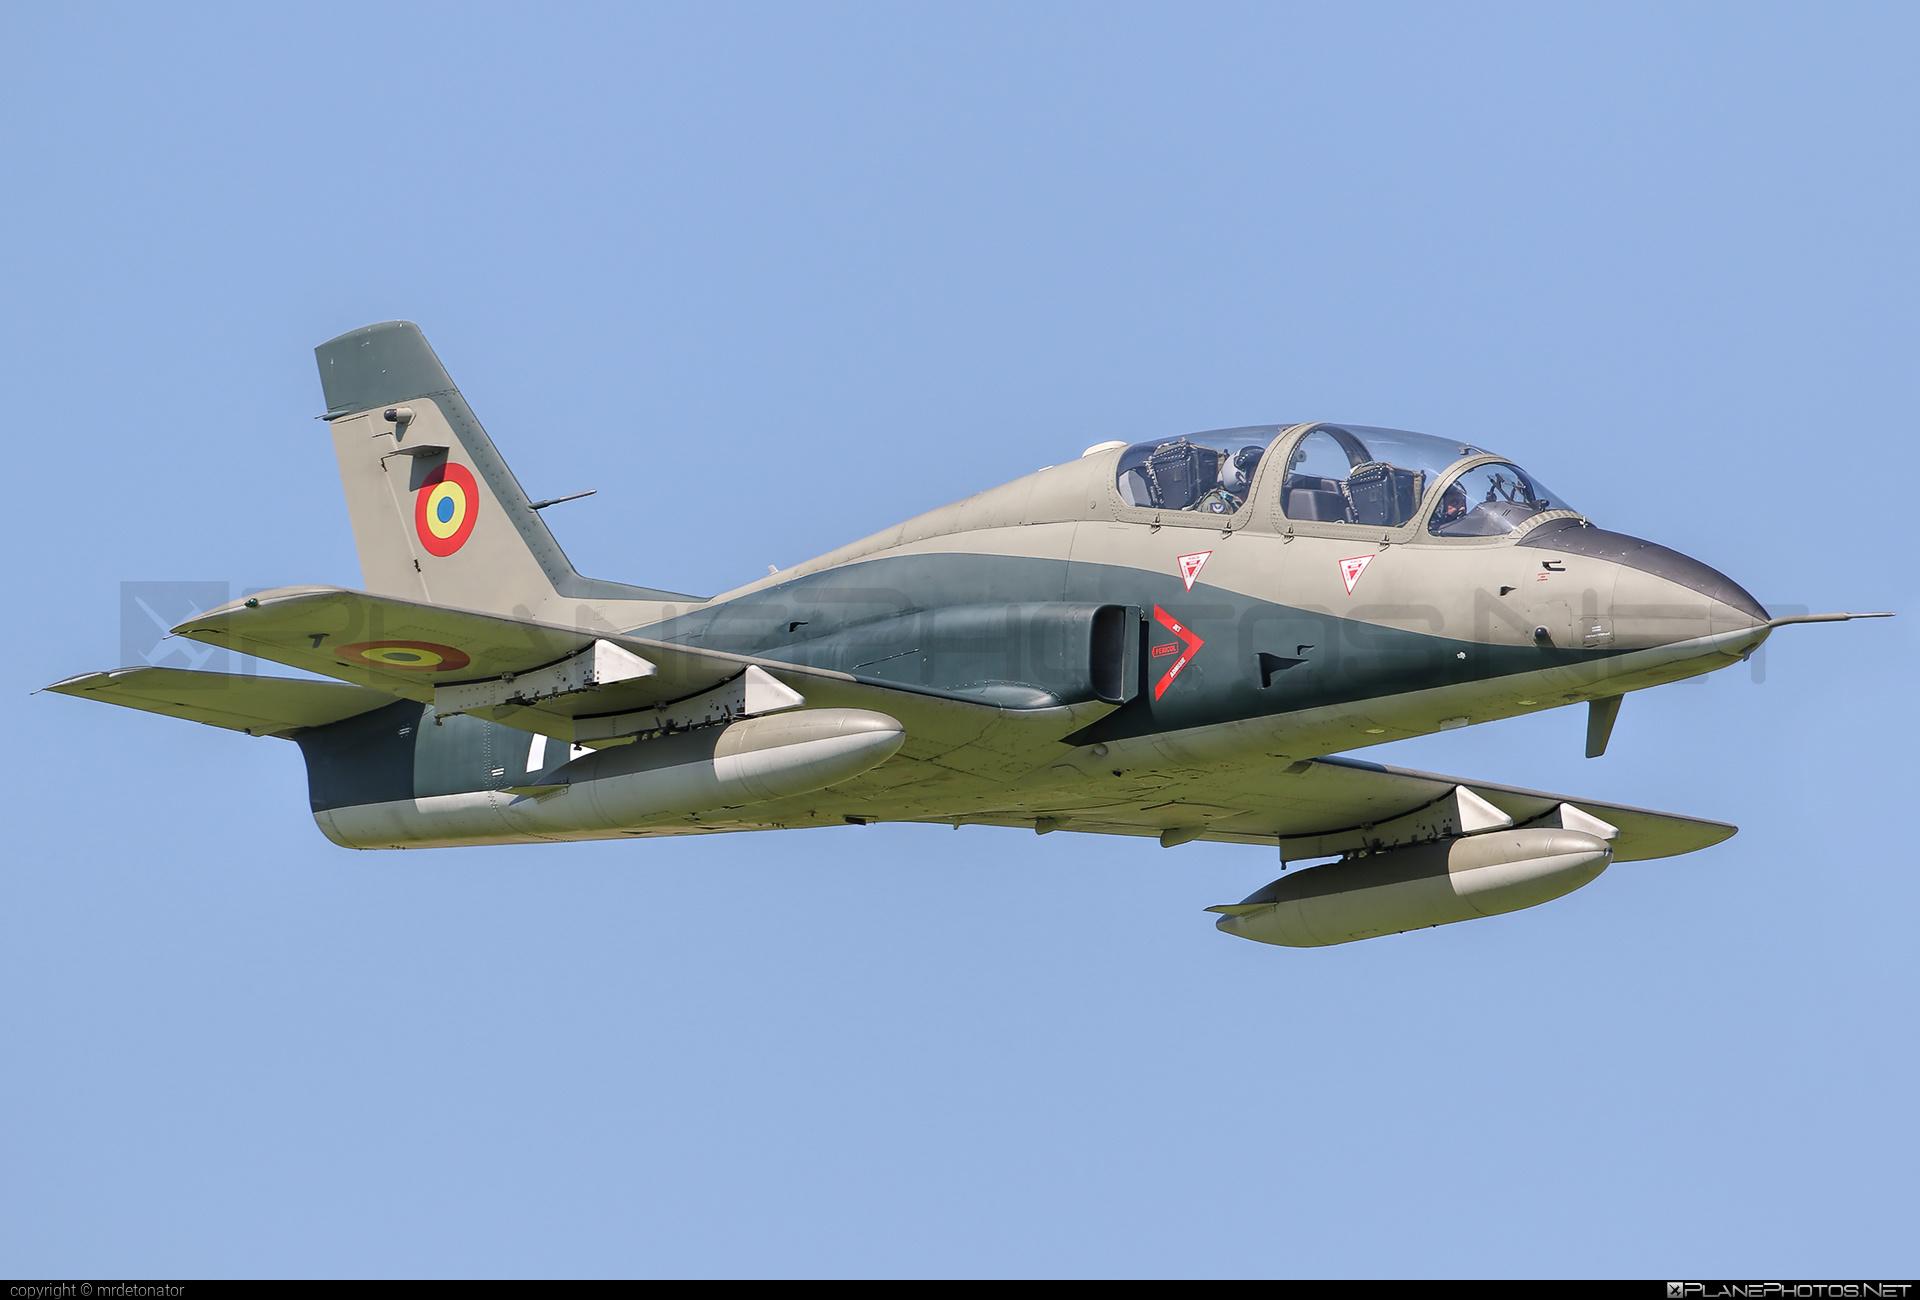 IAR IAR-99C Șoim - 725 operated by Forţele Aeriene Române (Romanian Air Force) #forteleaerieneromane #romanianairforce